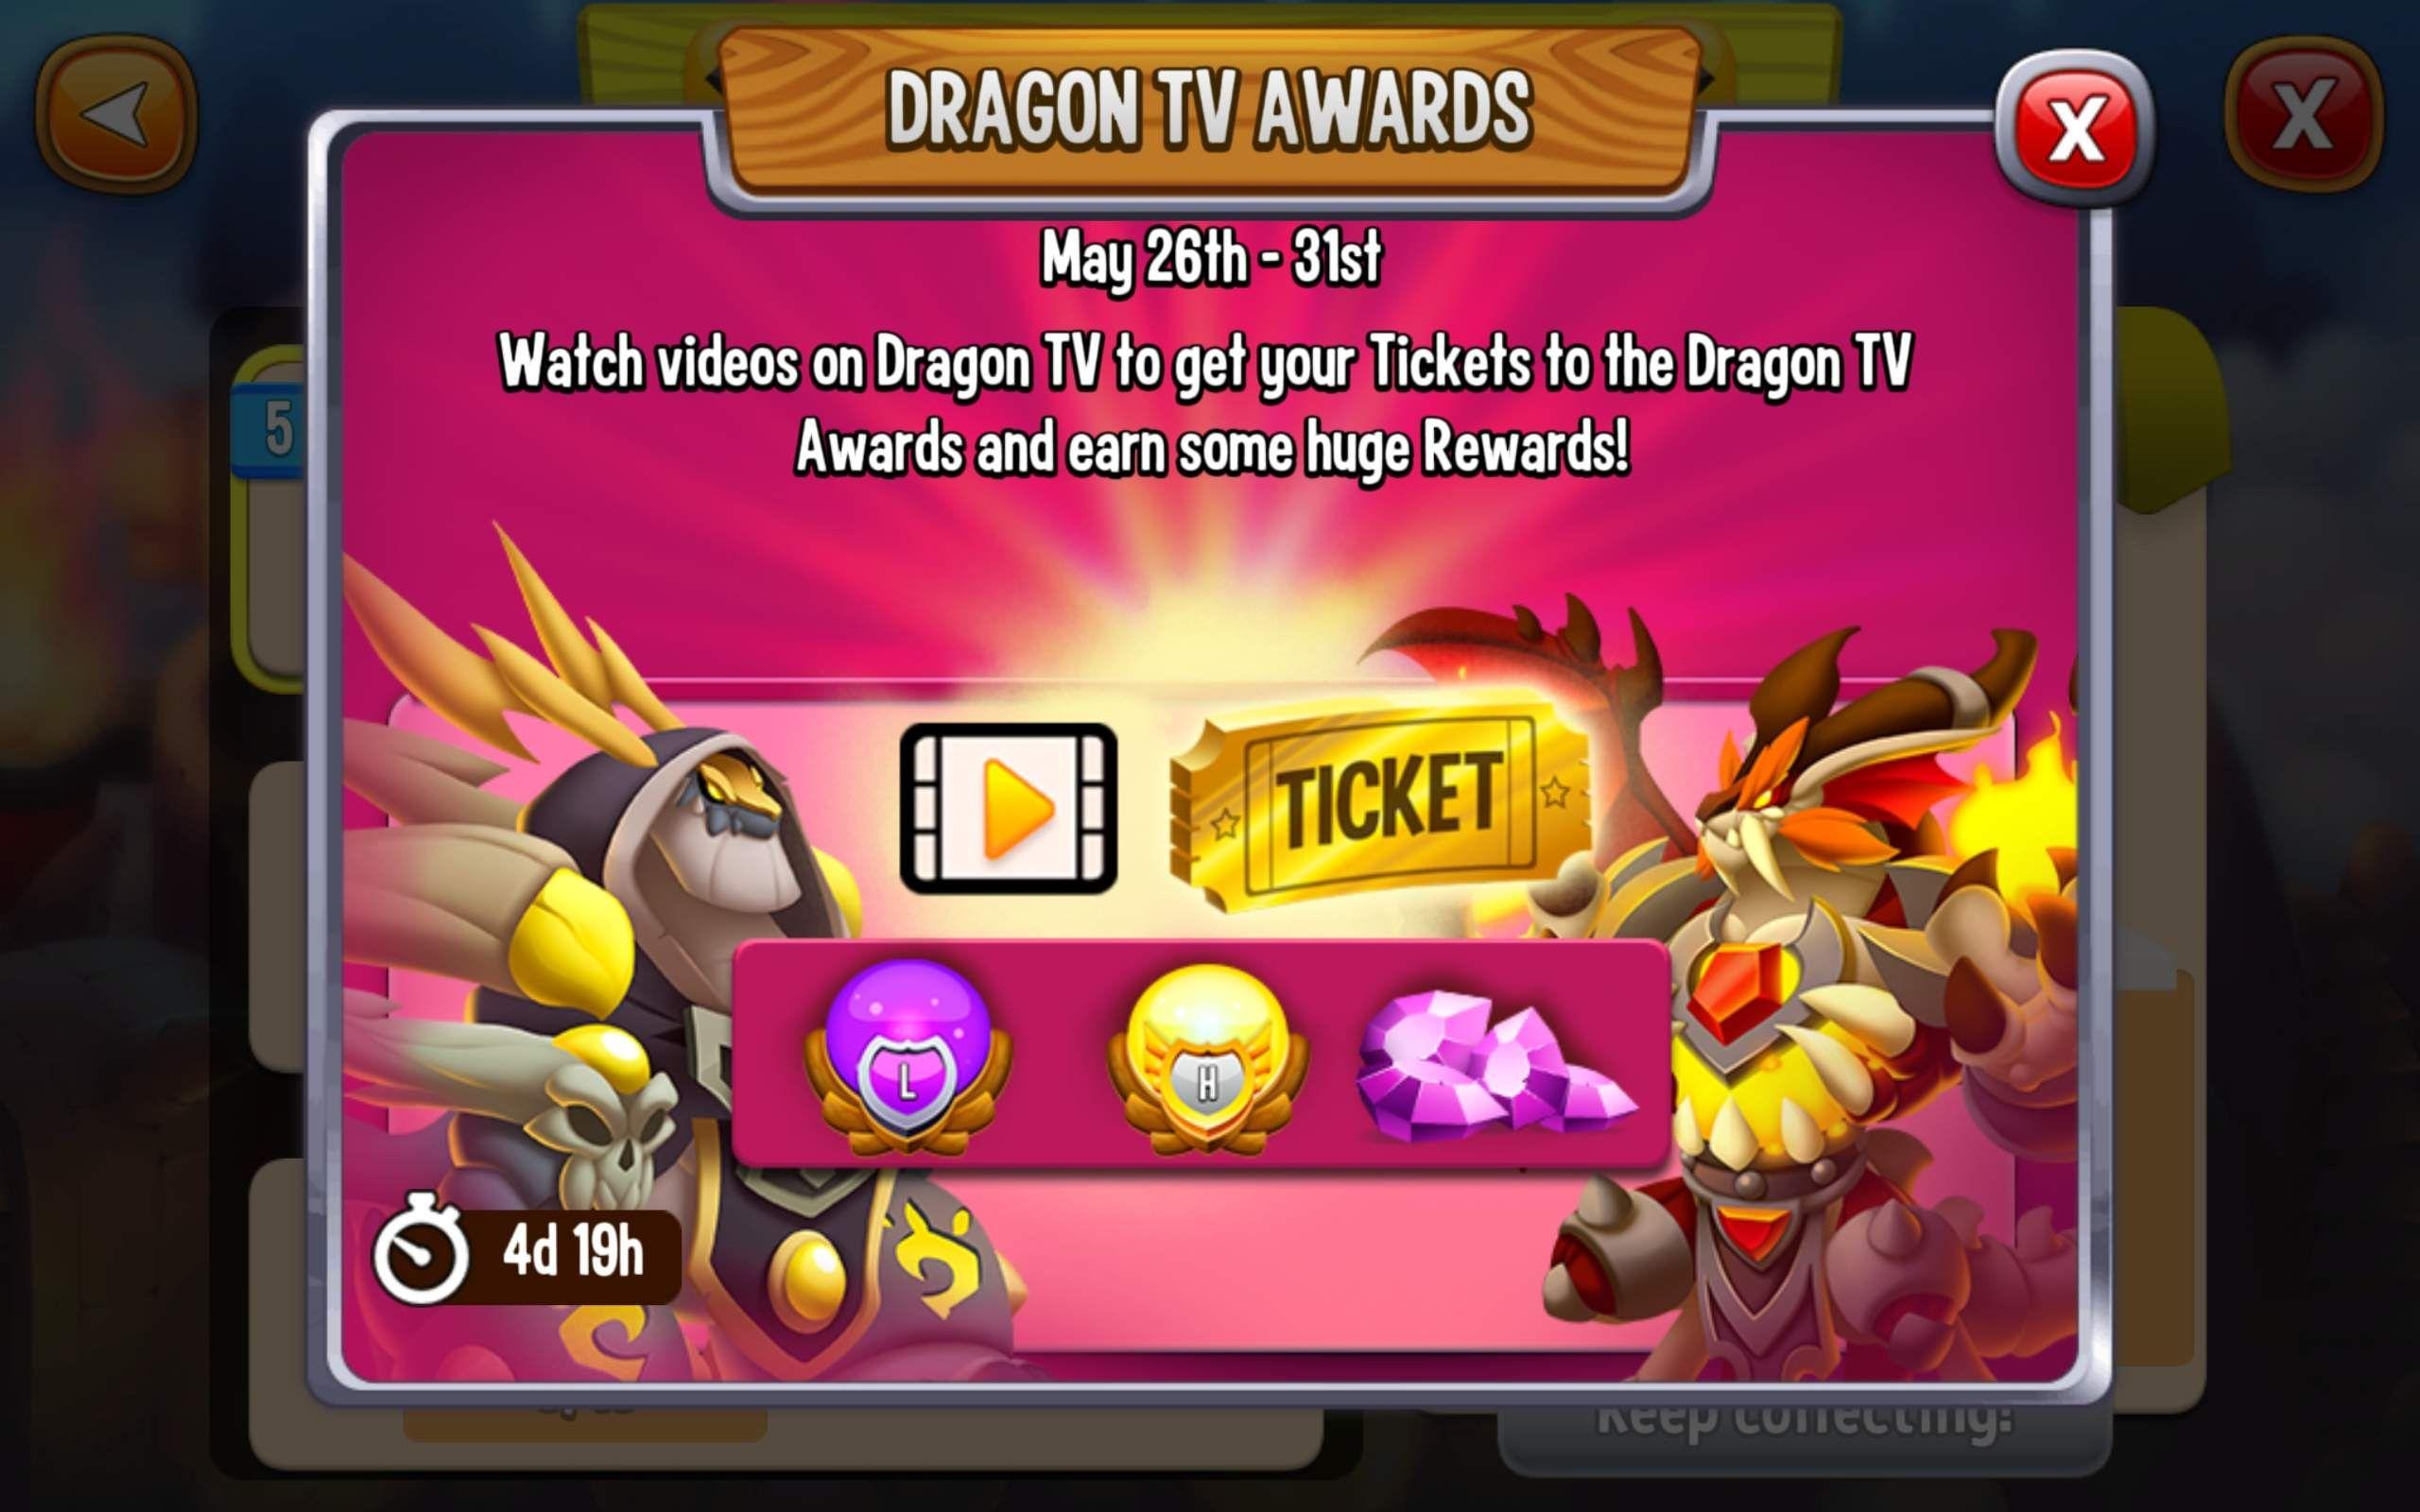 0_1622088700068_DragonCity_2021-05-26-10-03-36.jpg